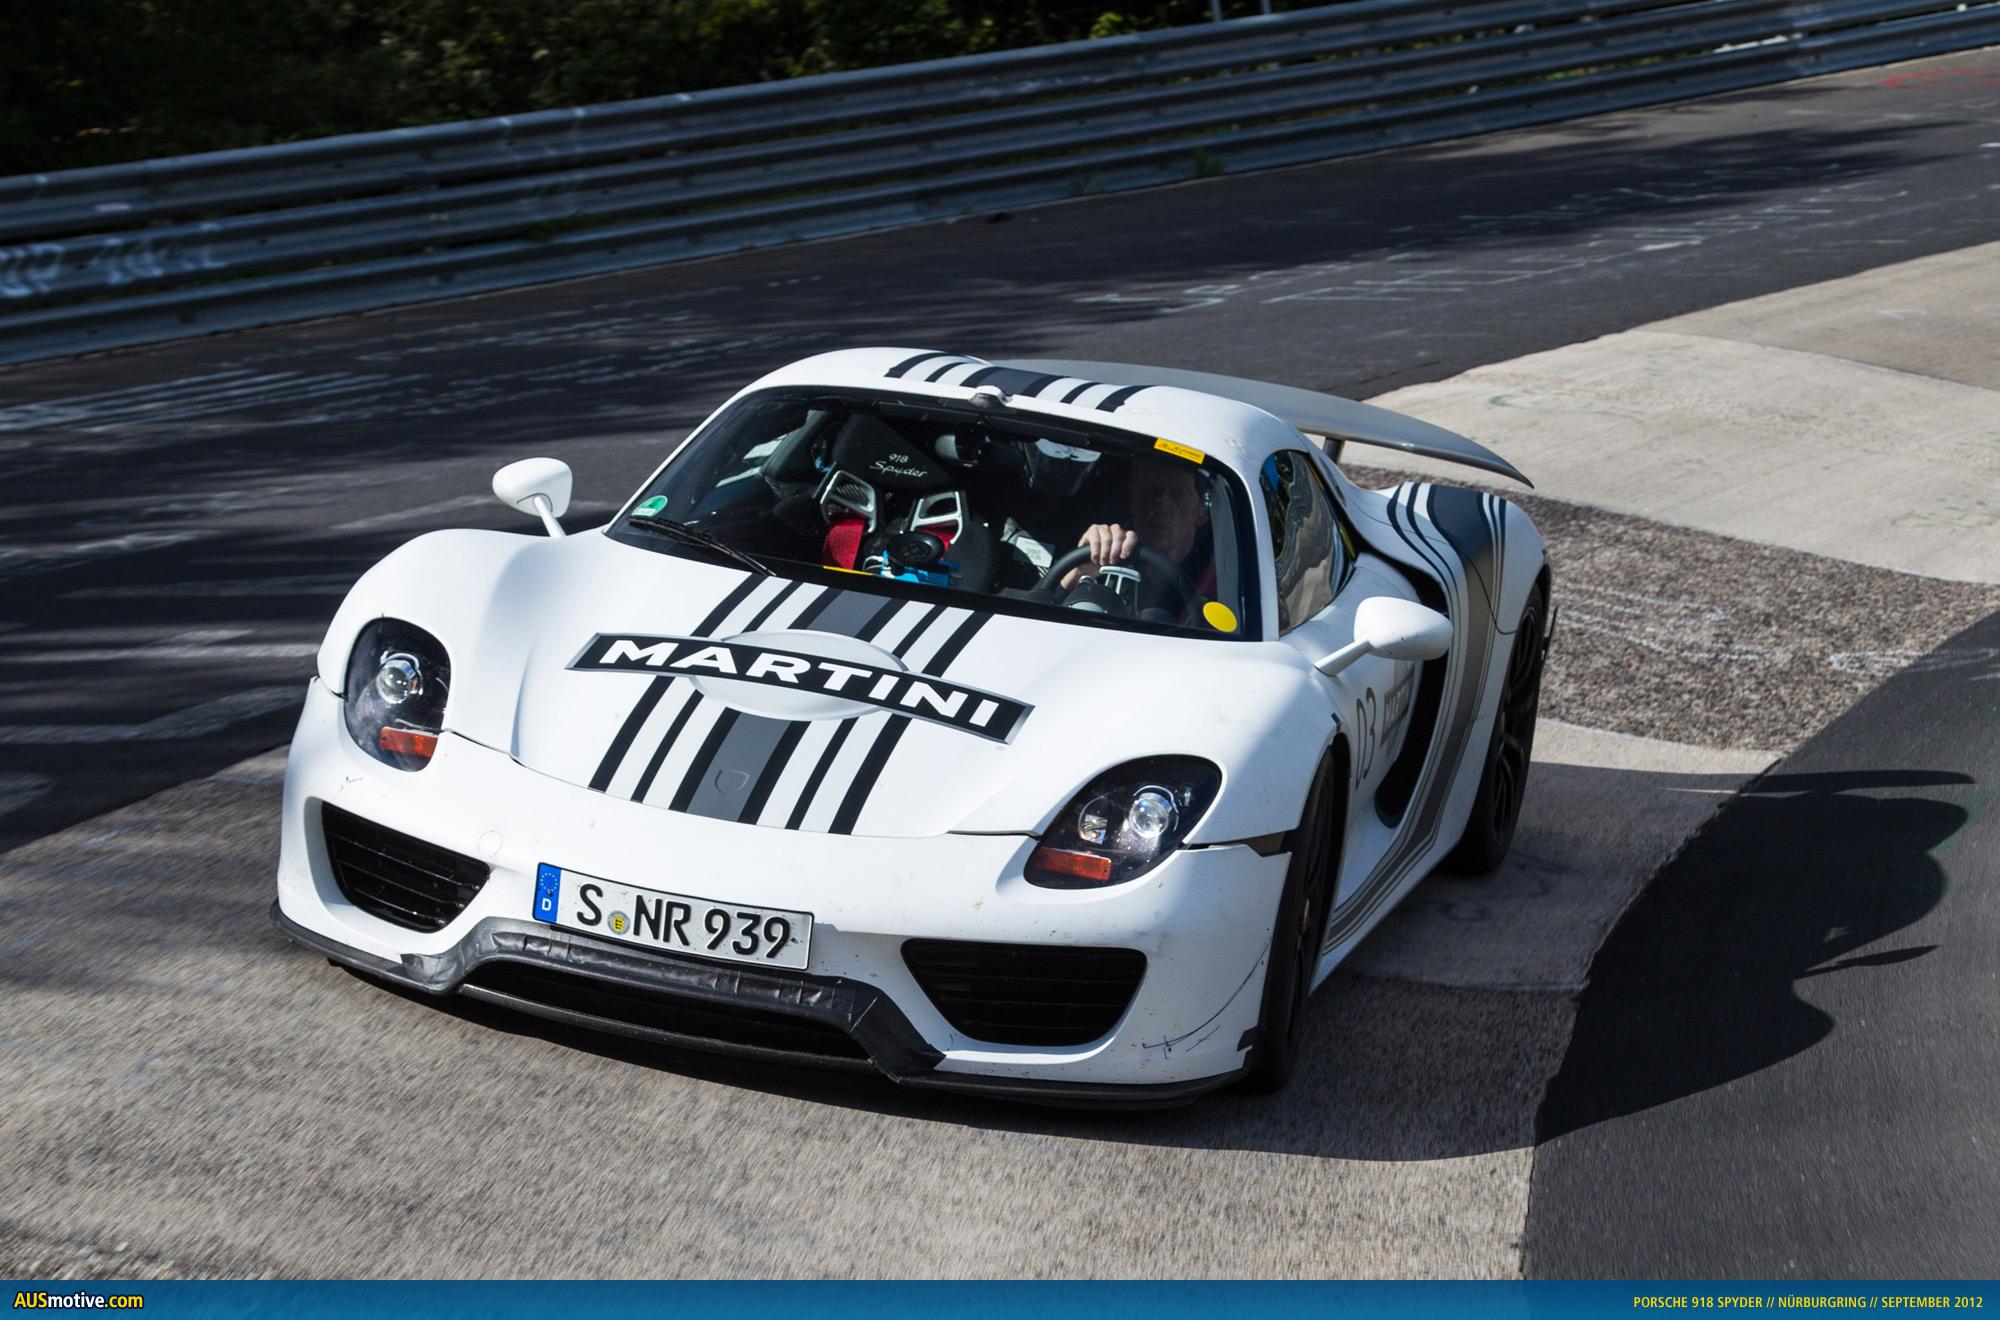 porsche 918 spyder prototype - Porsche 918 Production Wallpaper